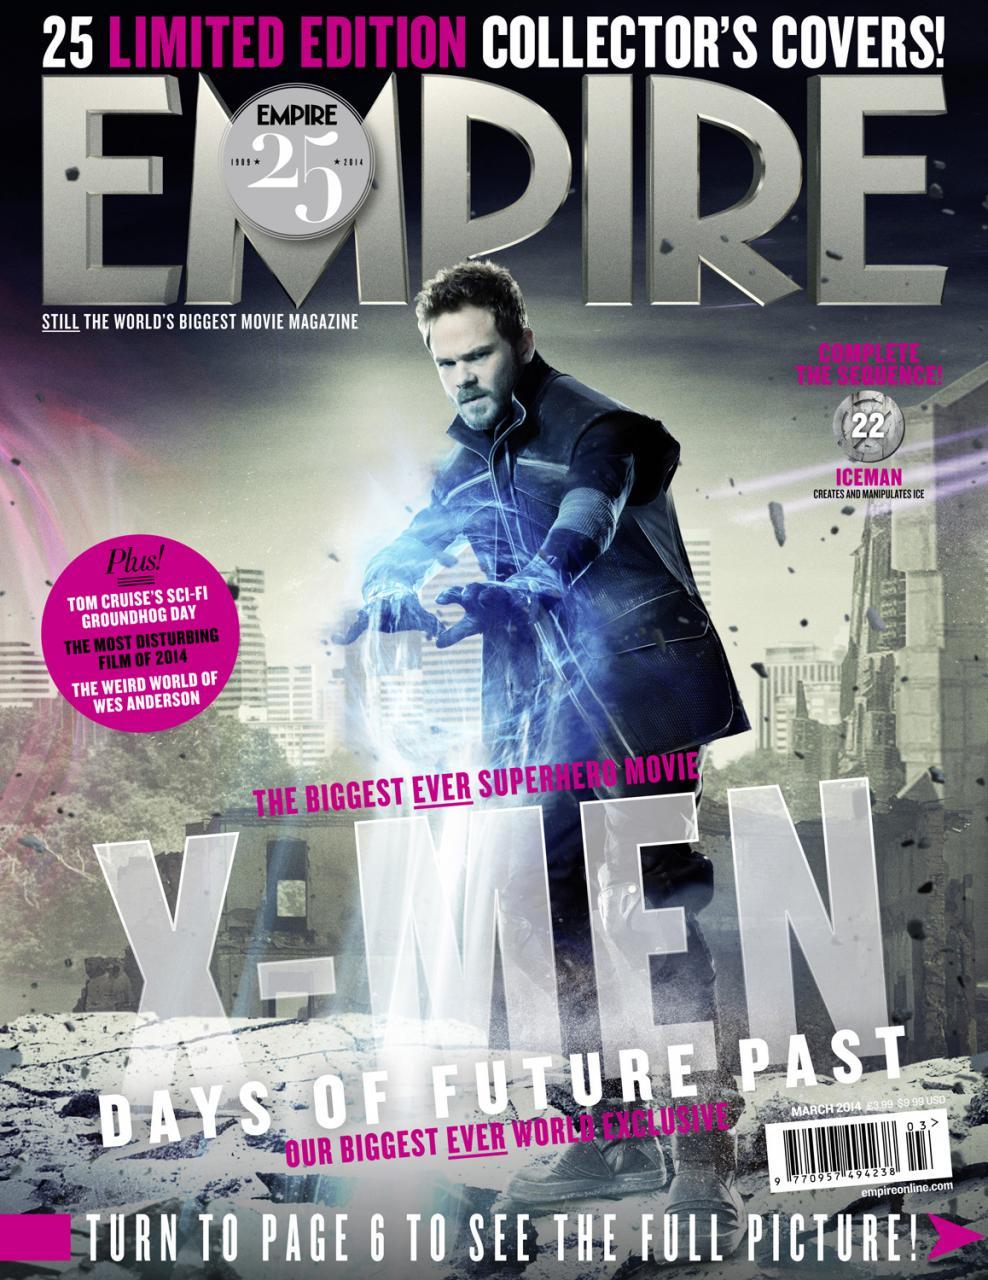 Empire Xmen Days Of Future Past Covers (6)